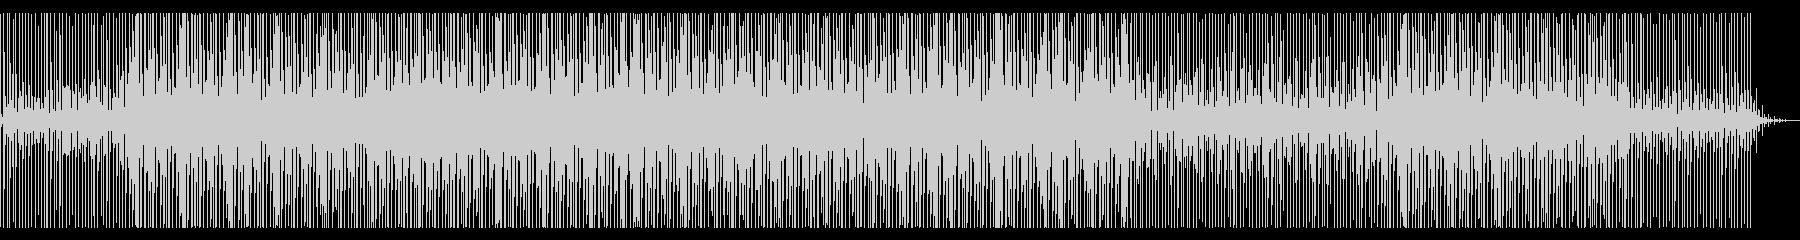 LightHouseの未再生の波形